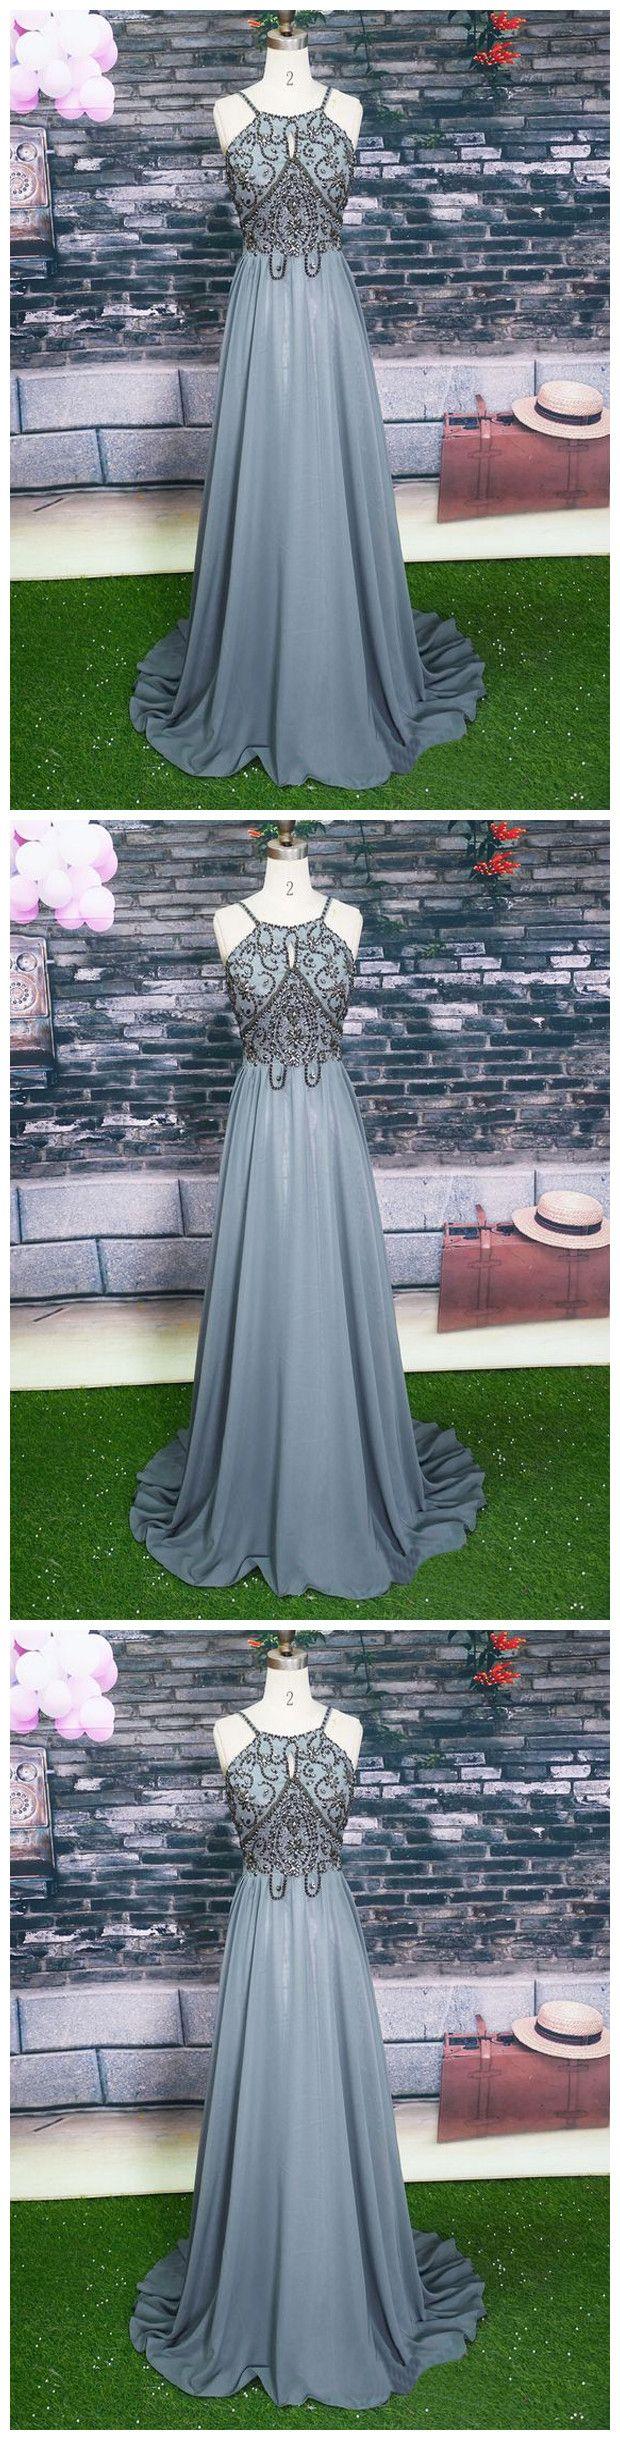 Halter Grey Beaded Prom Dress,Long Beading Prom Dresses